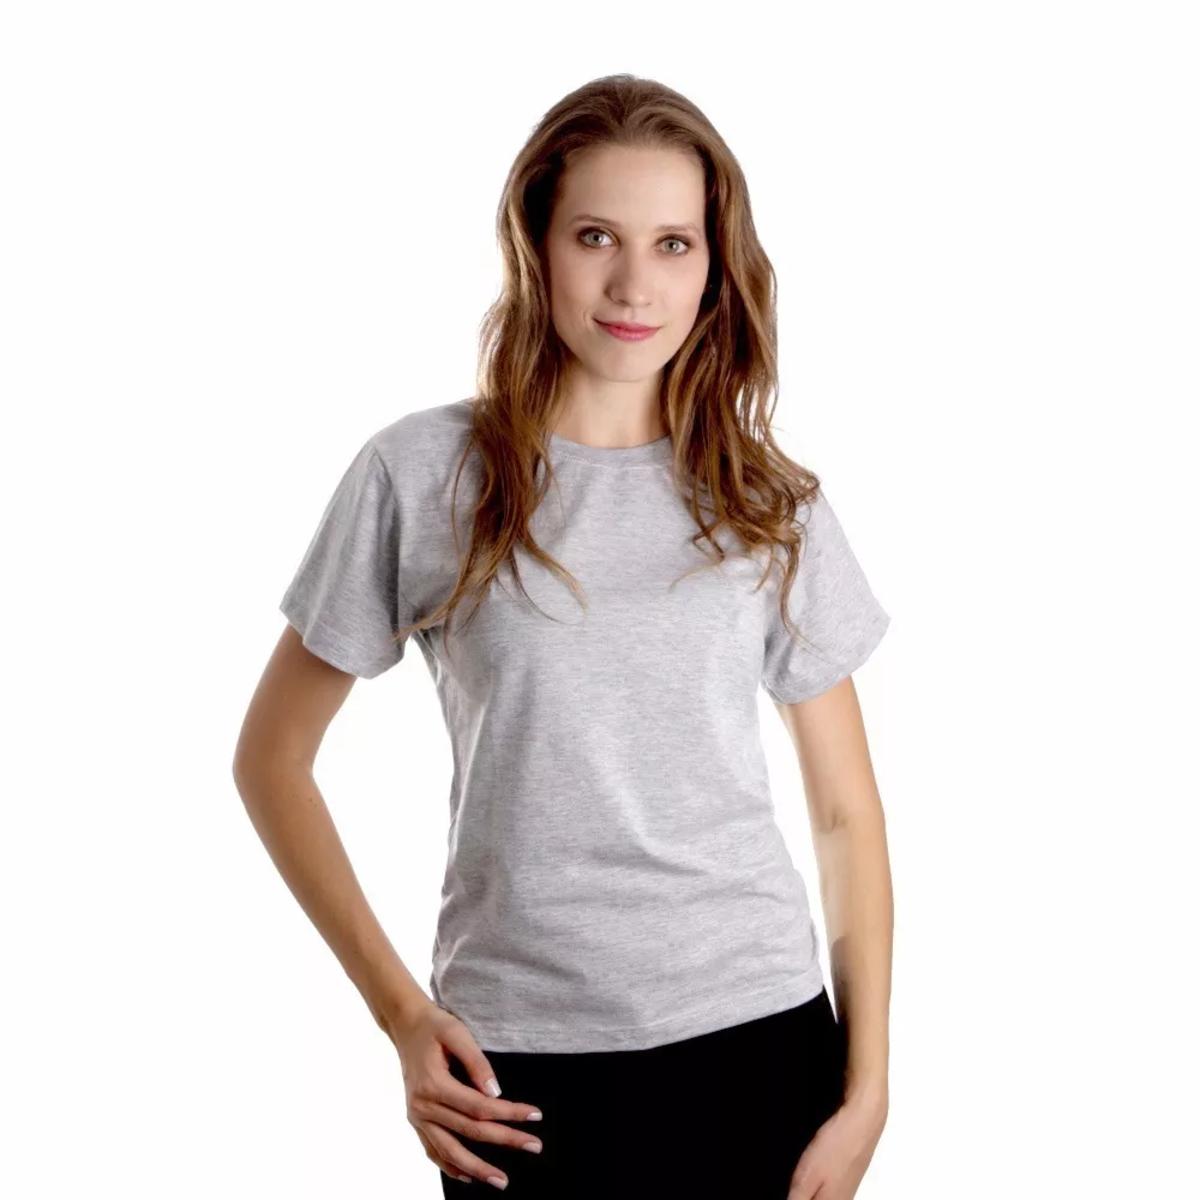 d602b367d4564 Camiseta Baby Look Feminina Algodão Lisa Camisa Mescla Cinza no Elo7 ...